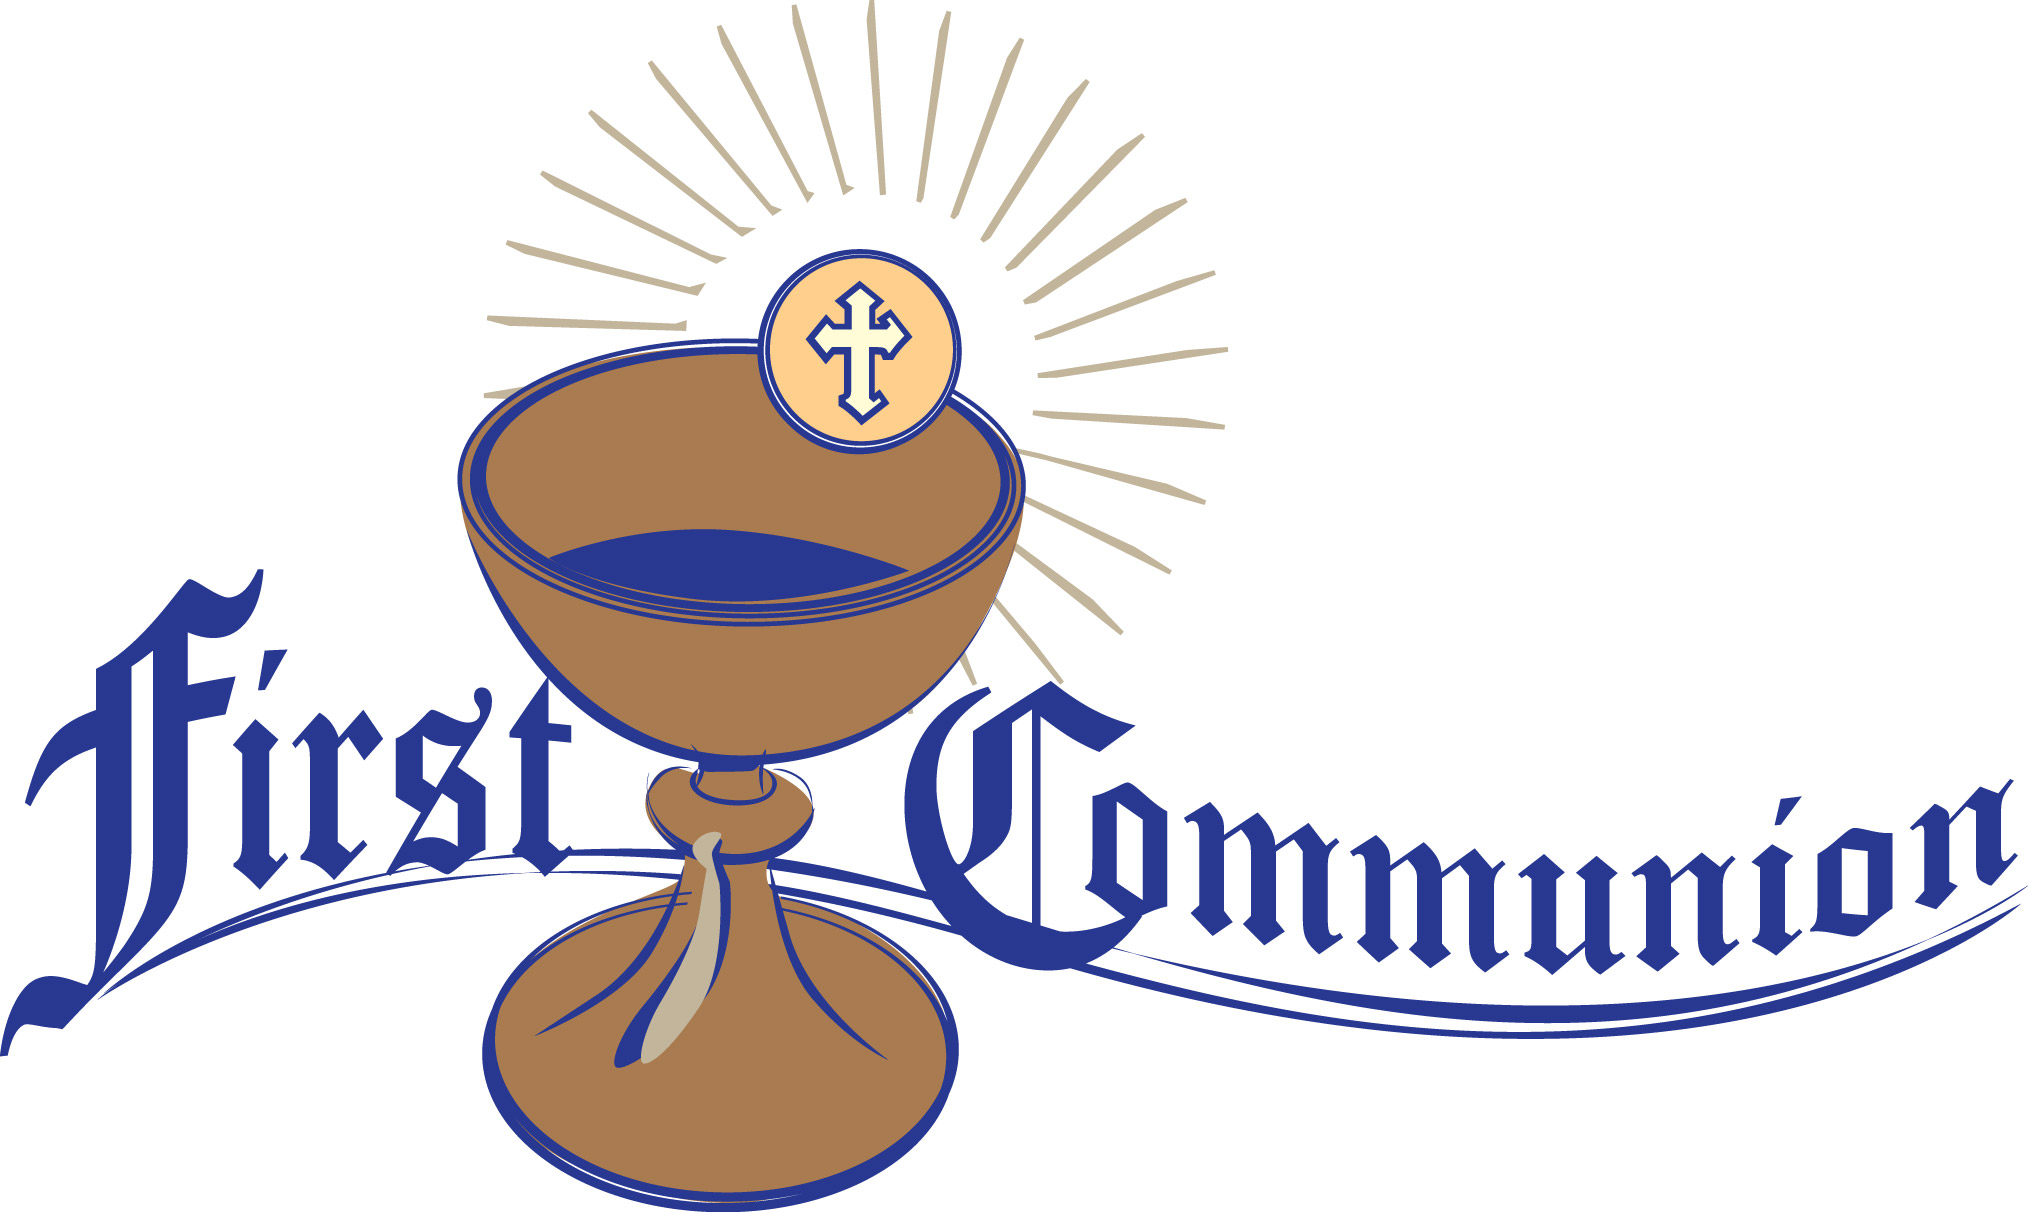 first holy communion mhoc rh mhoc org au first holy communion symbols clip art first holy communion clip art free